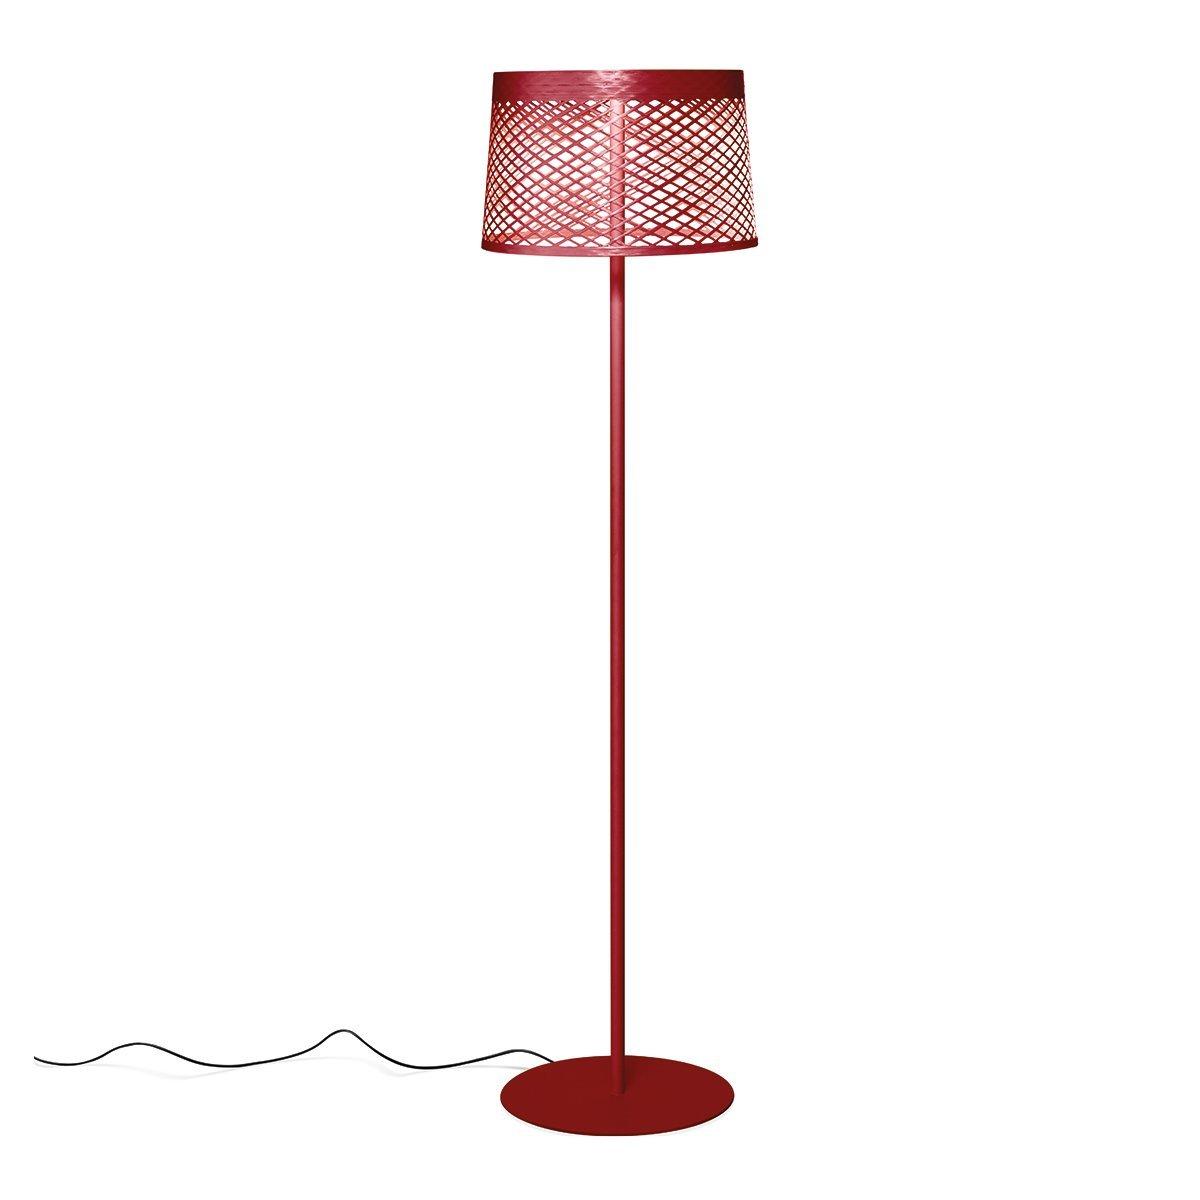 Foscarini Twiggy Grid Lettura Outdoor Vloerlamp Rood